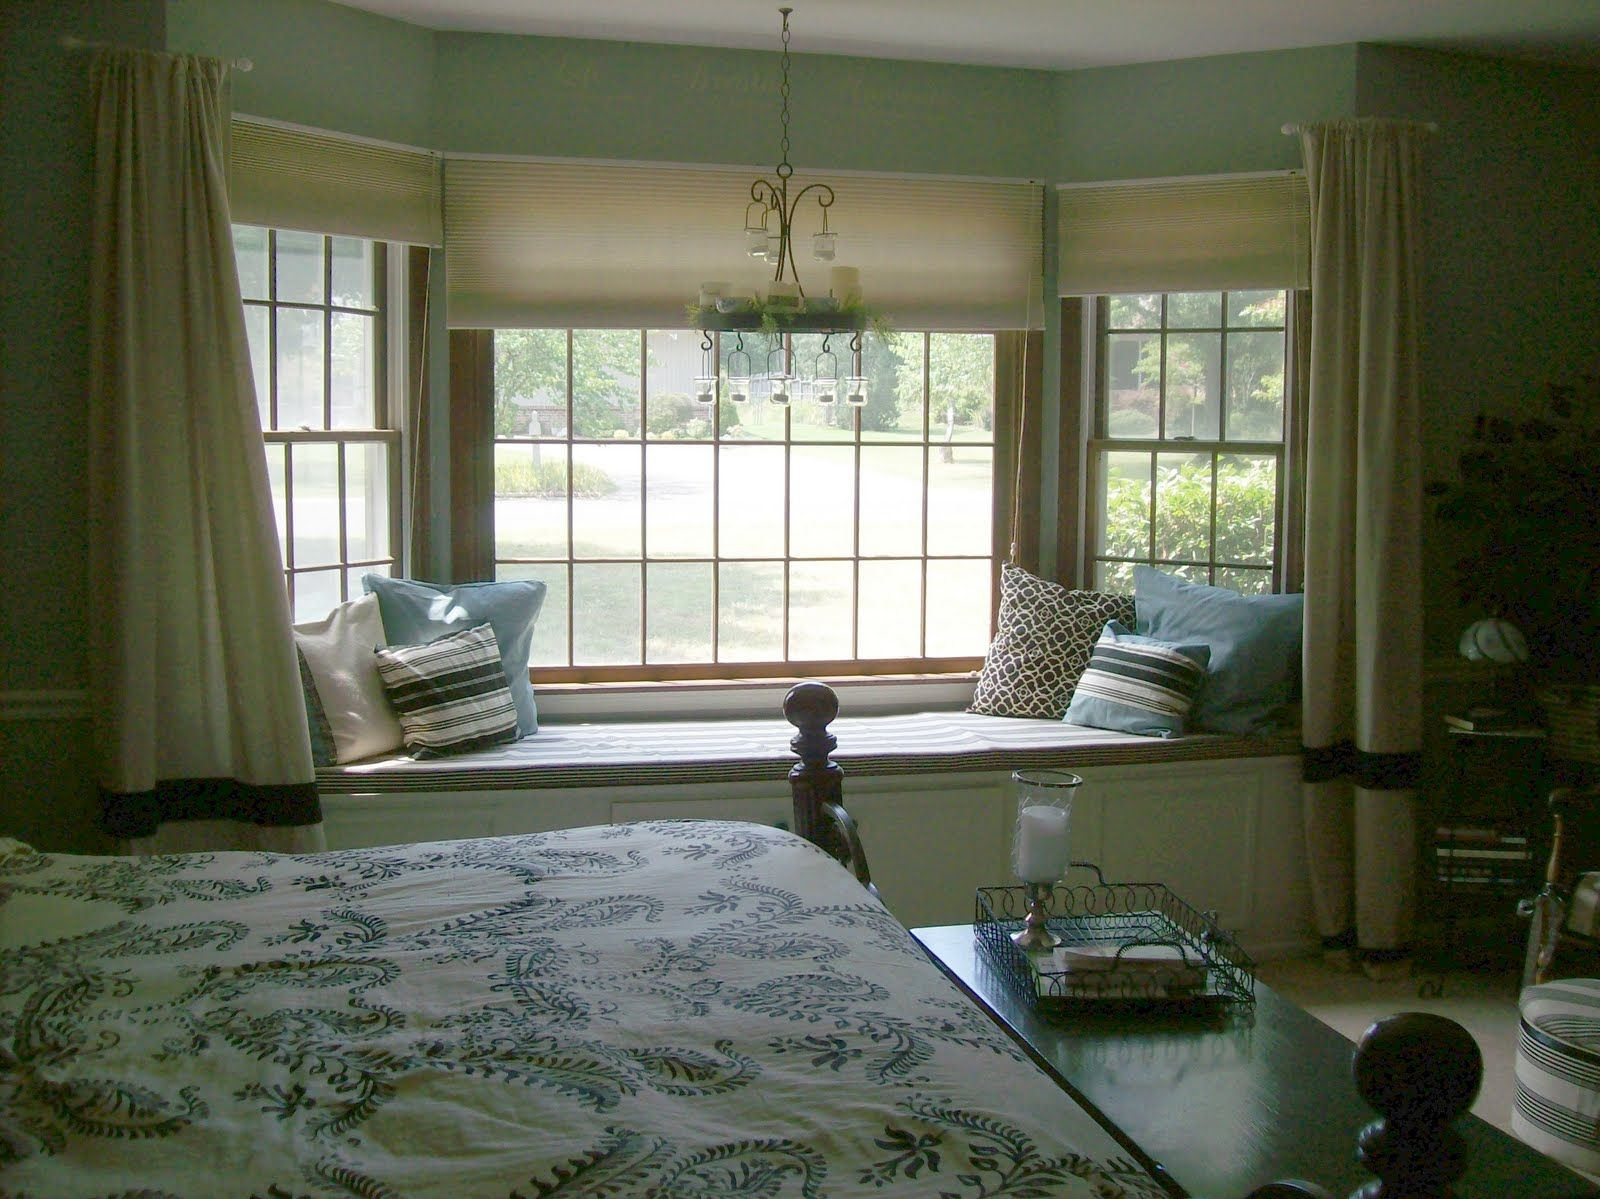 Remarkable Brown Bedroom Bay Window Design Idea With Cream